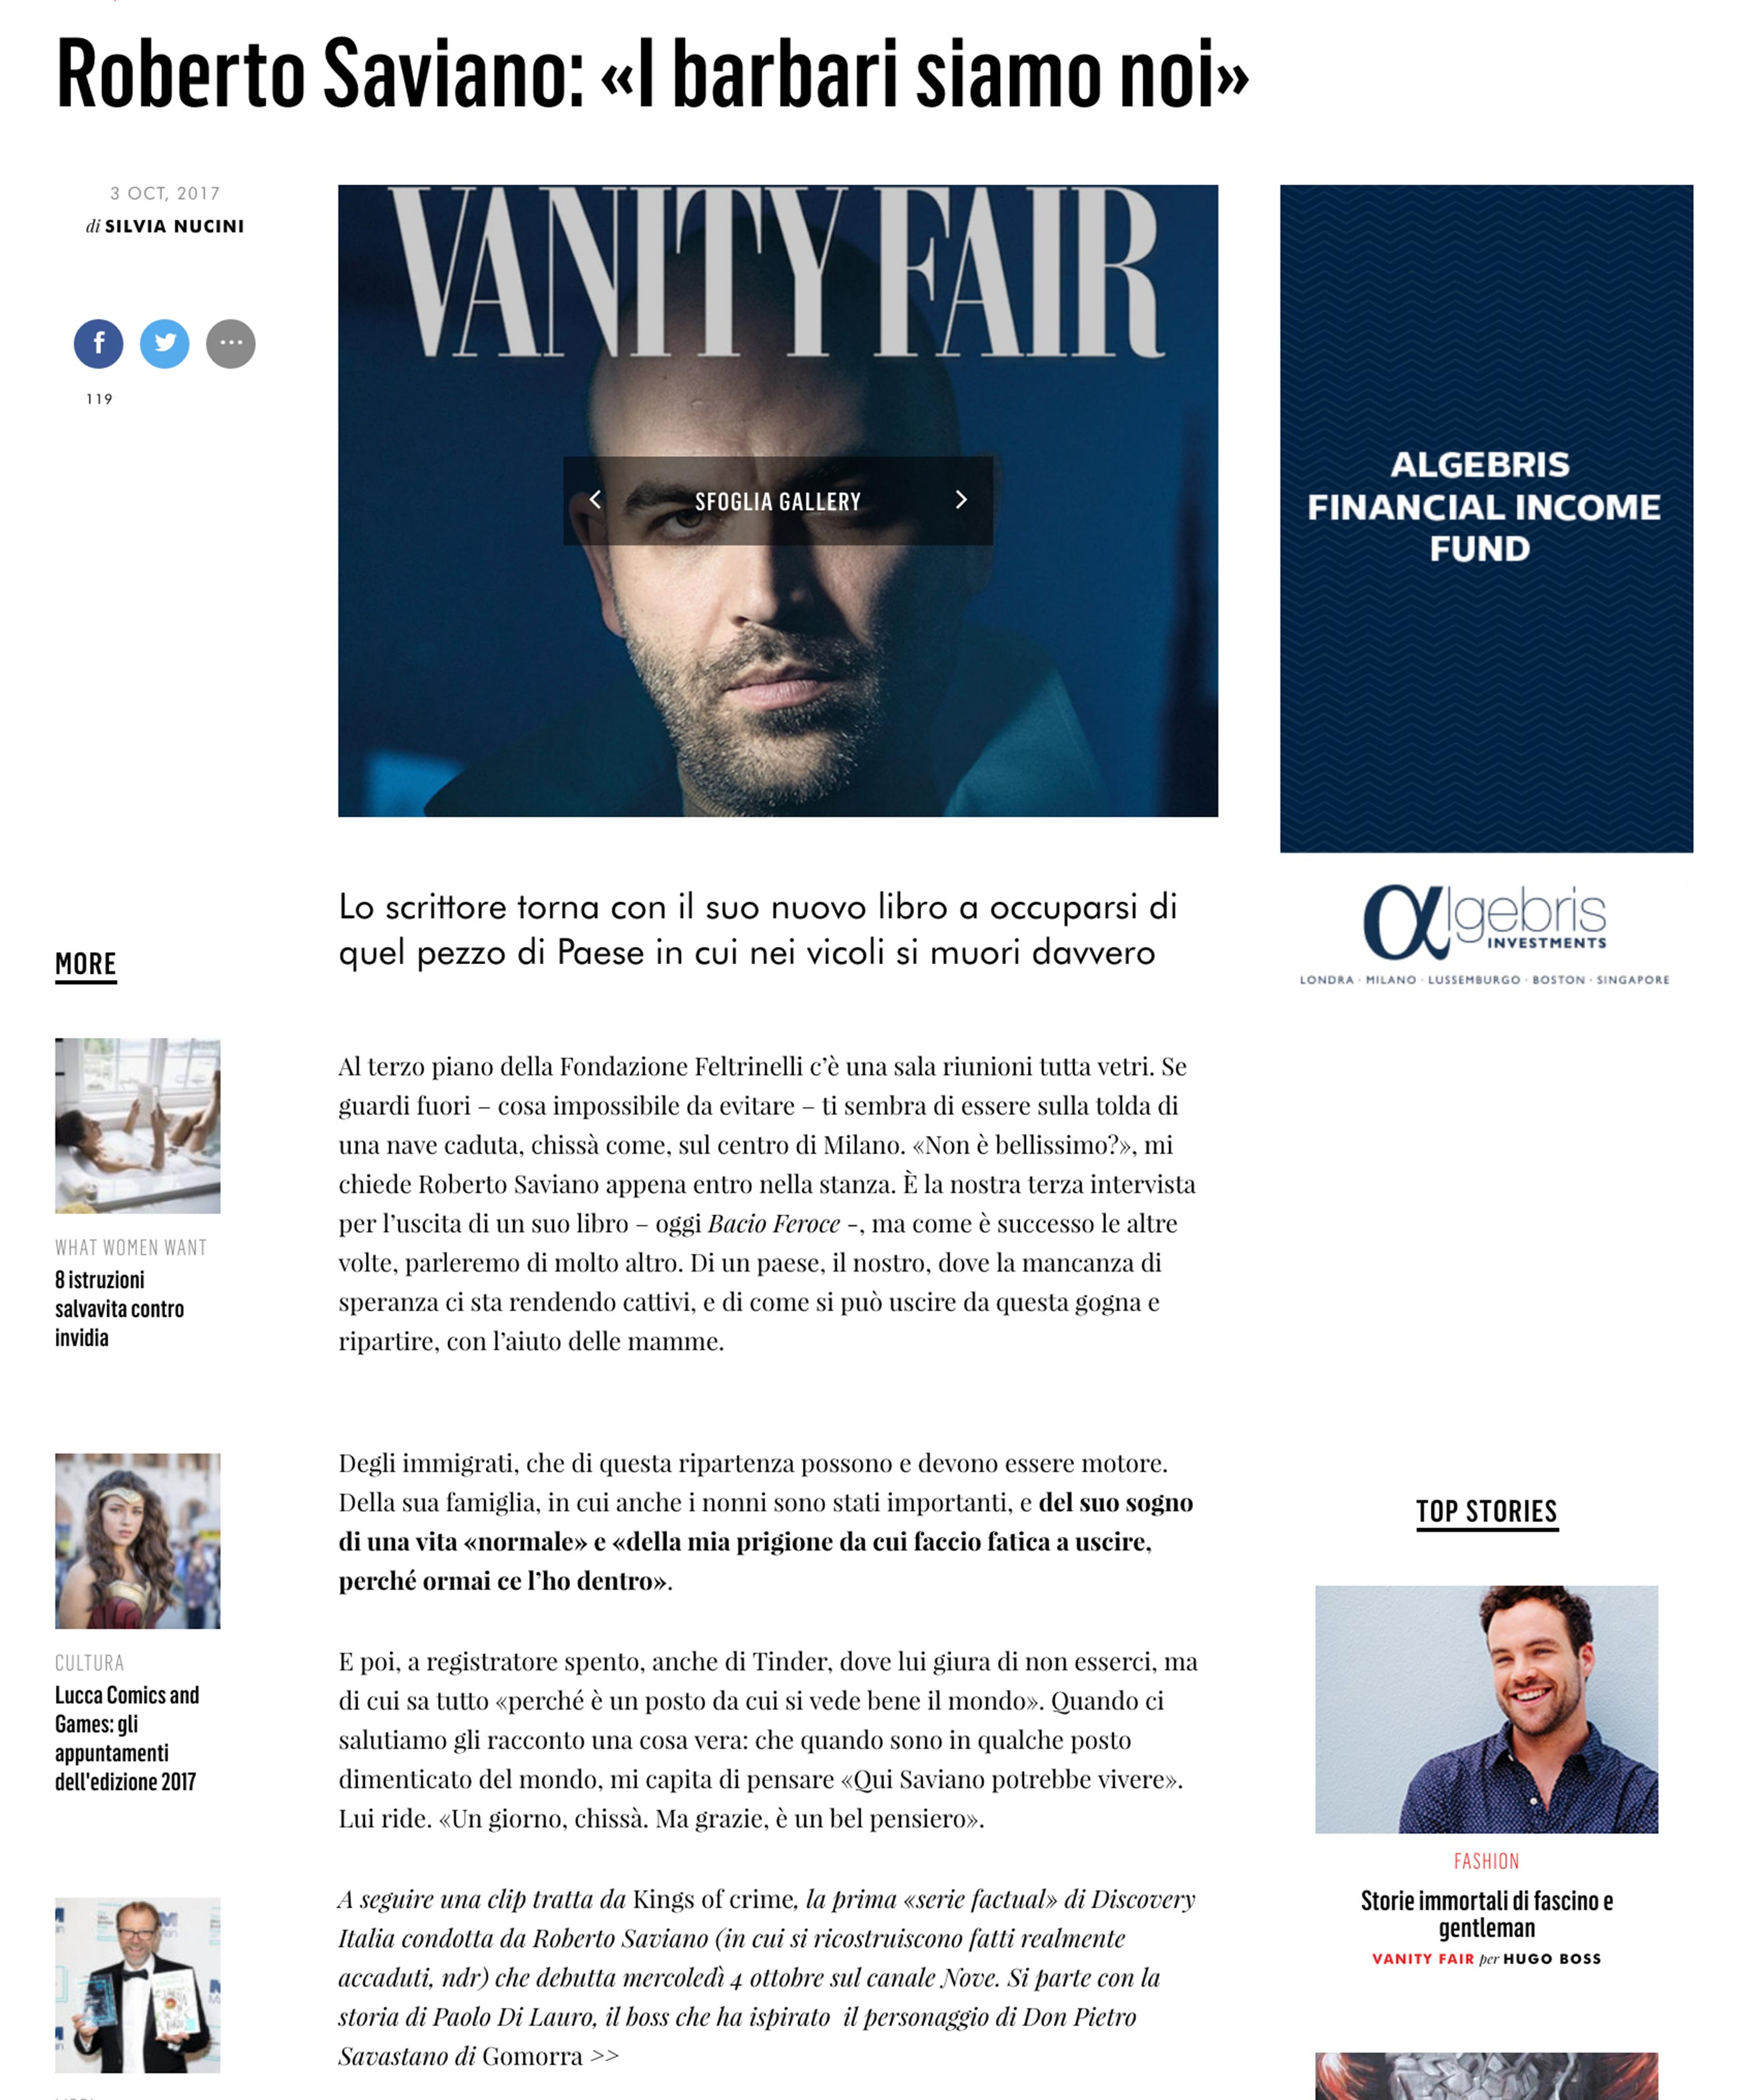 Vanity_Fair_Roberto_Saviano_press_hotel_viu